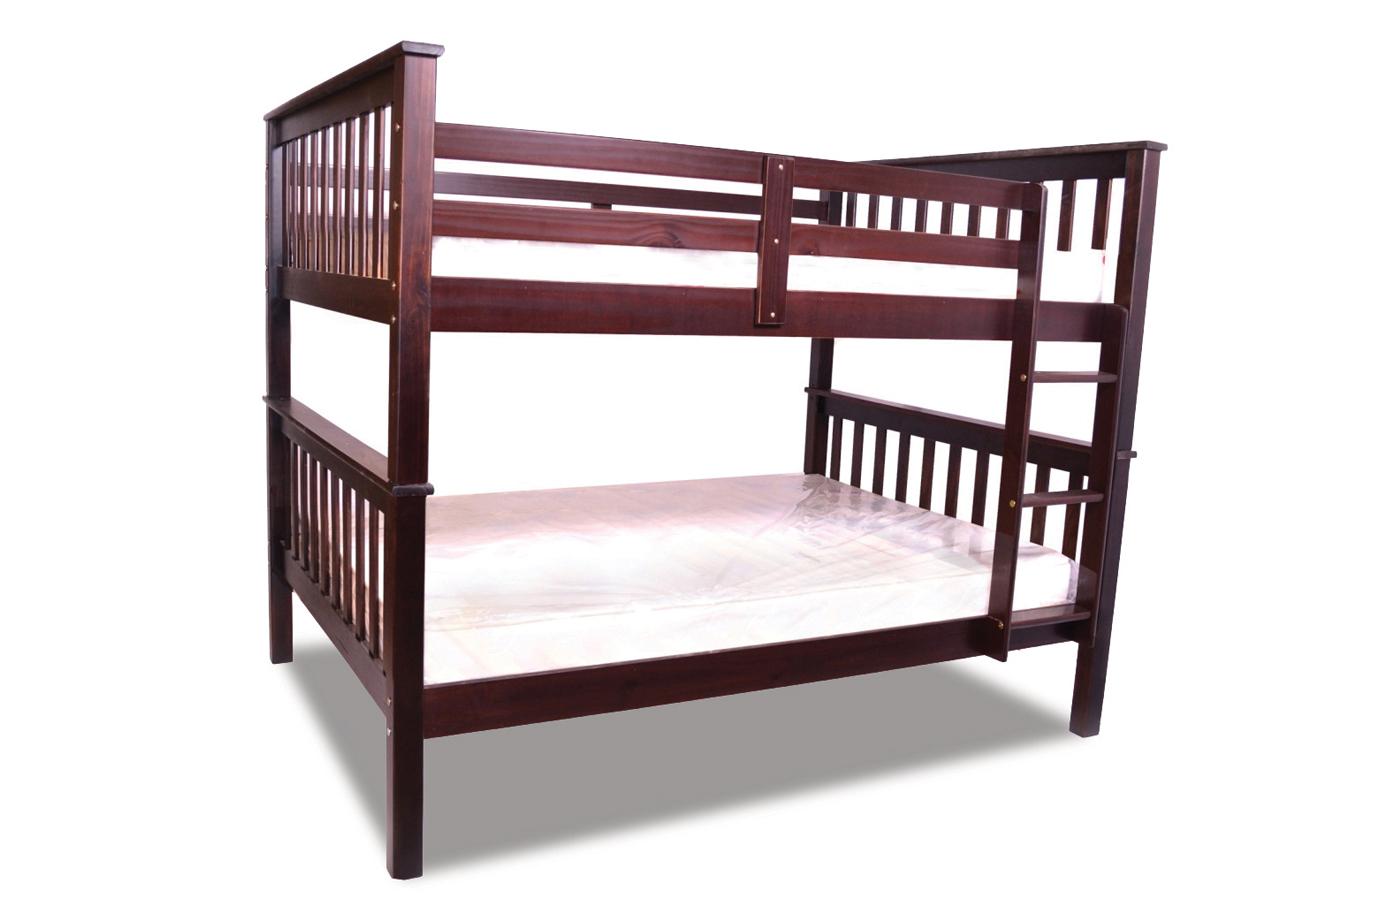 T2502 Bunk Bed